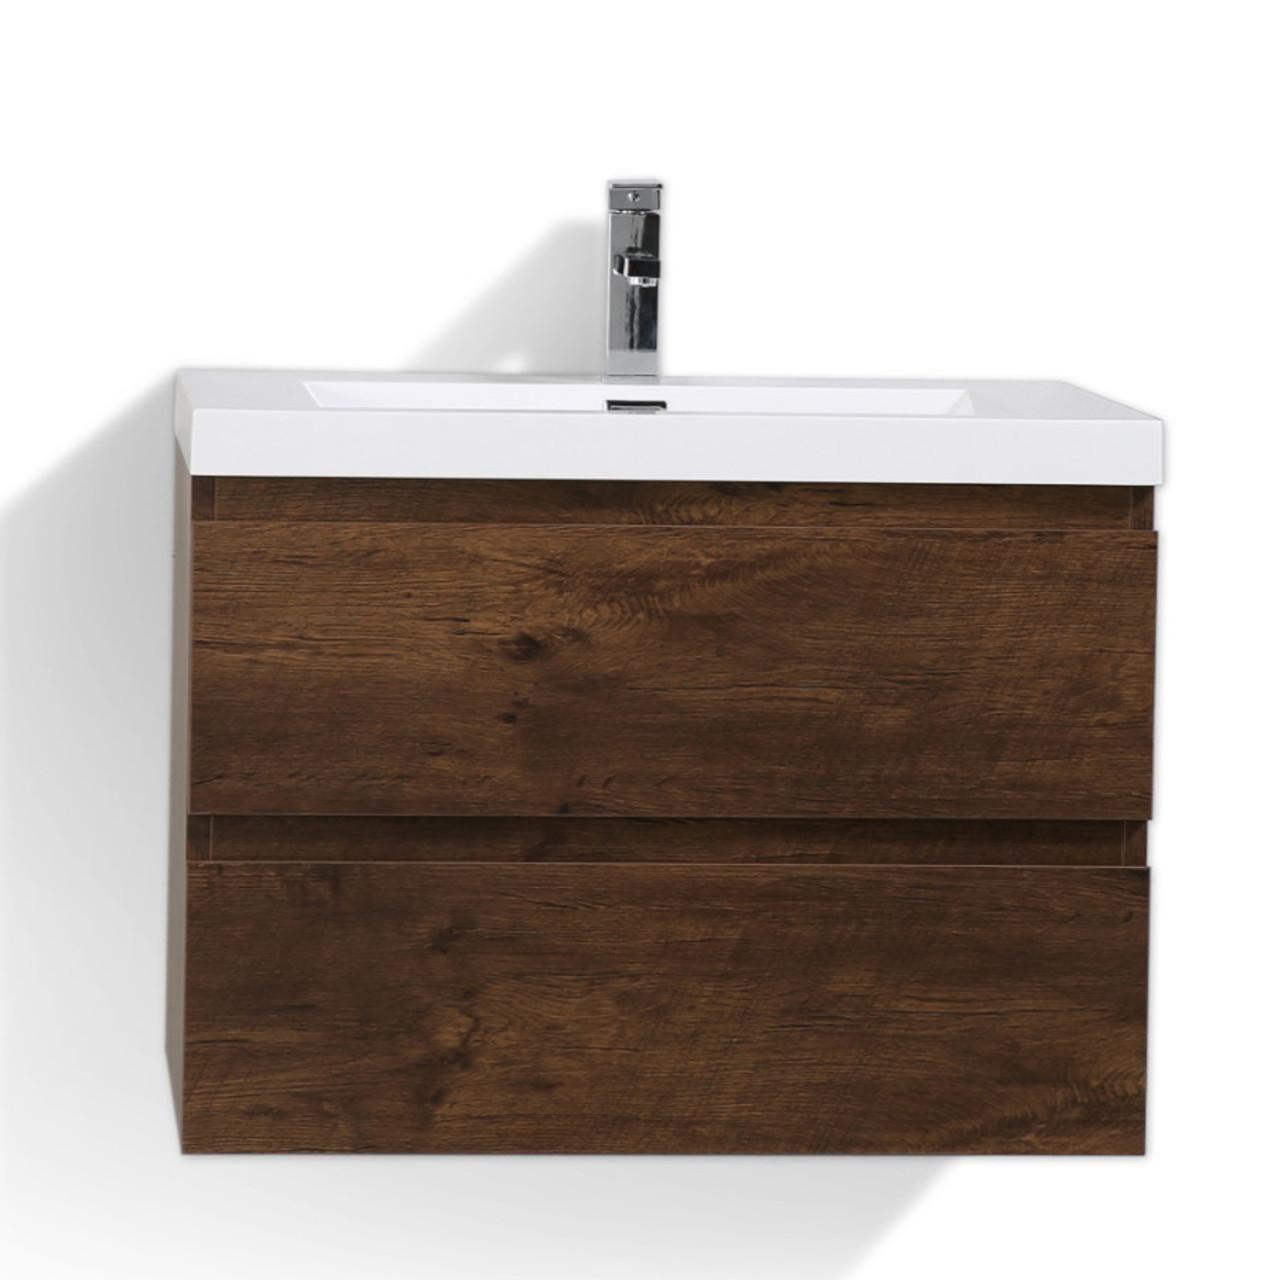 Moreno Mob 30 Rose Wood Wall Mounted Modern Bathroom Vanity With Reeinforced Acrylic Sink Bathroom Vanities Wholesale Inc